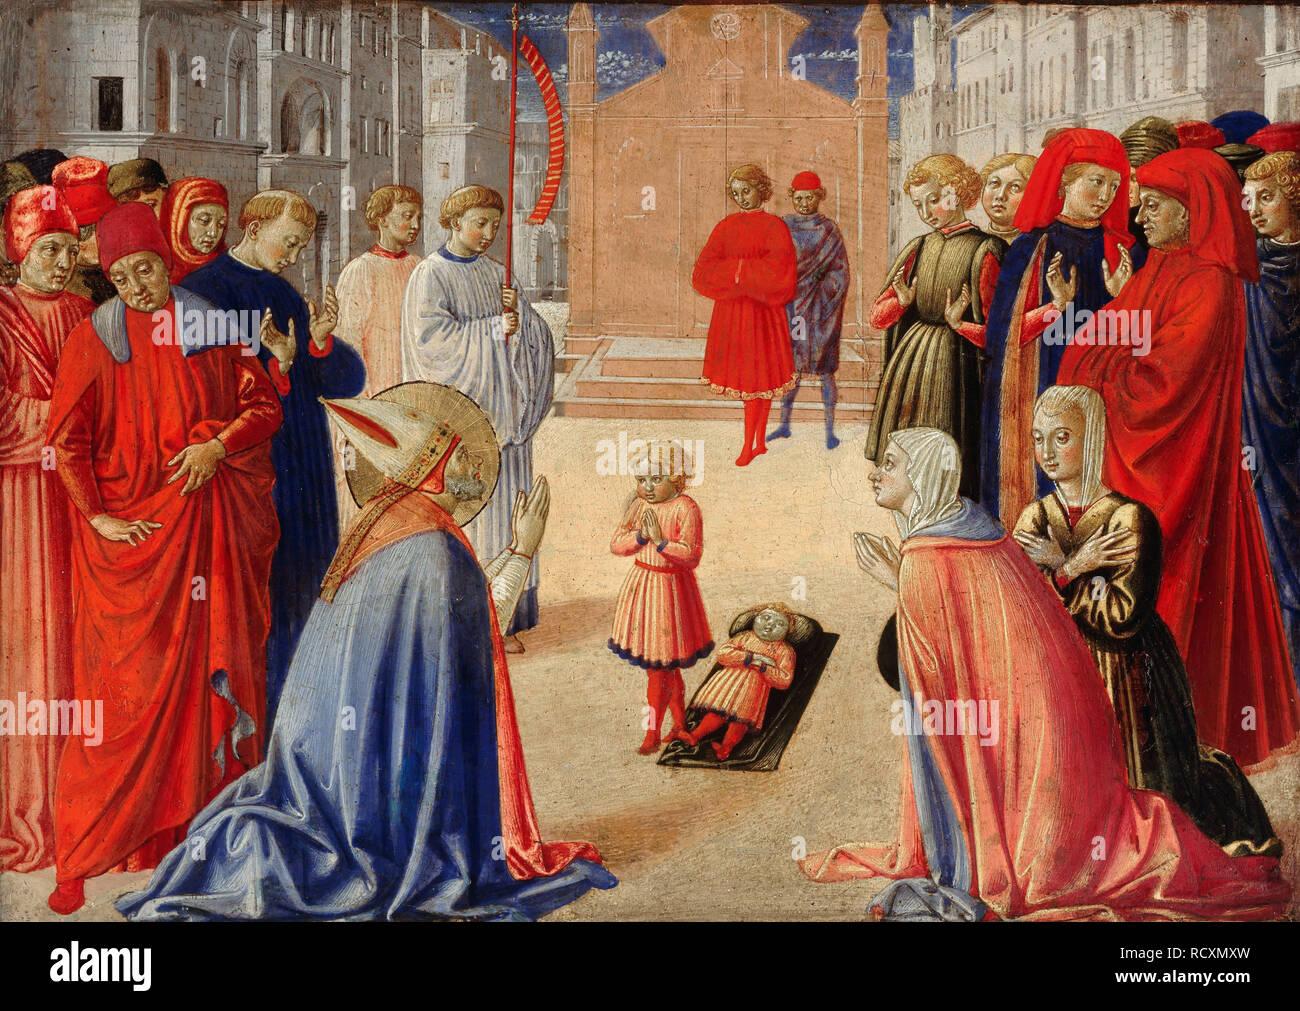 Saint Zenobius raises a boy from the dead. Museum: Staatliche Museen, Berlin. Author: GOZZOLI, BENOZZO. - Stock Image